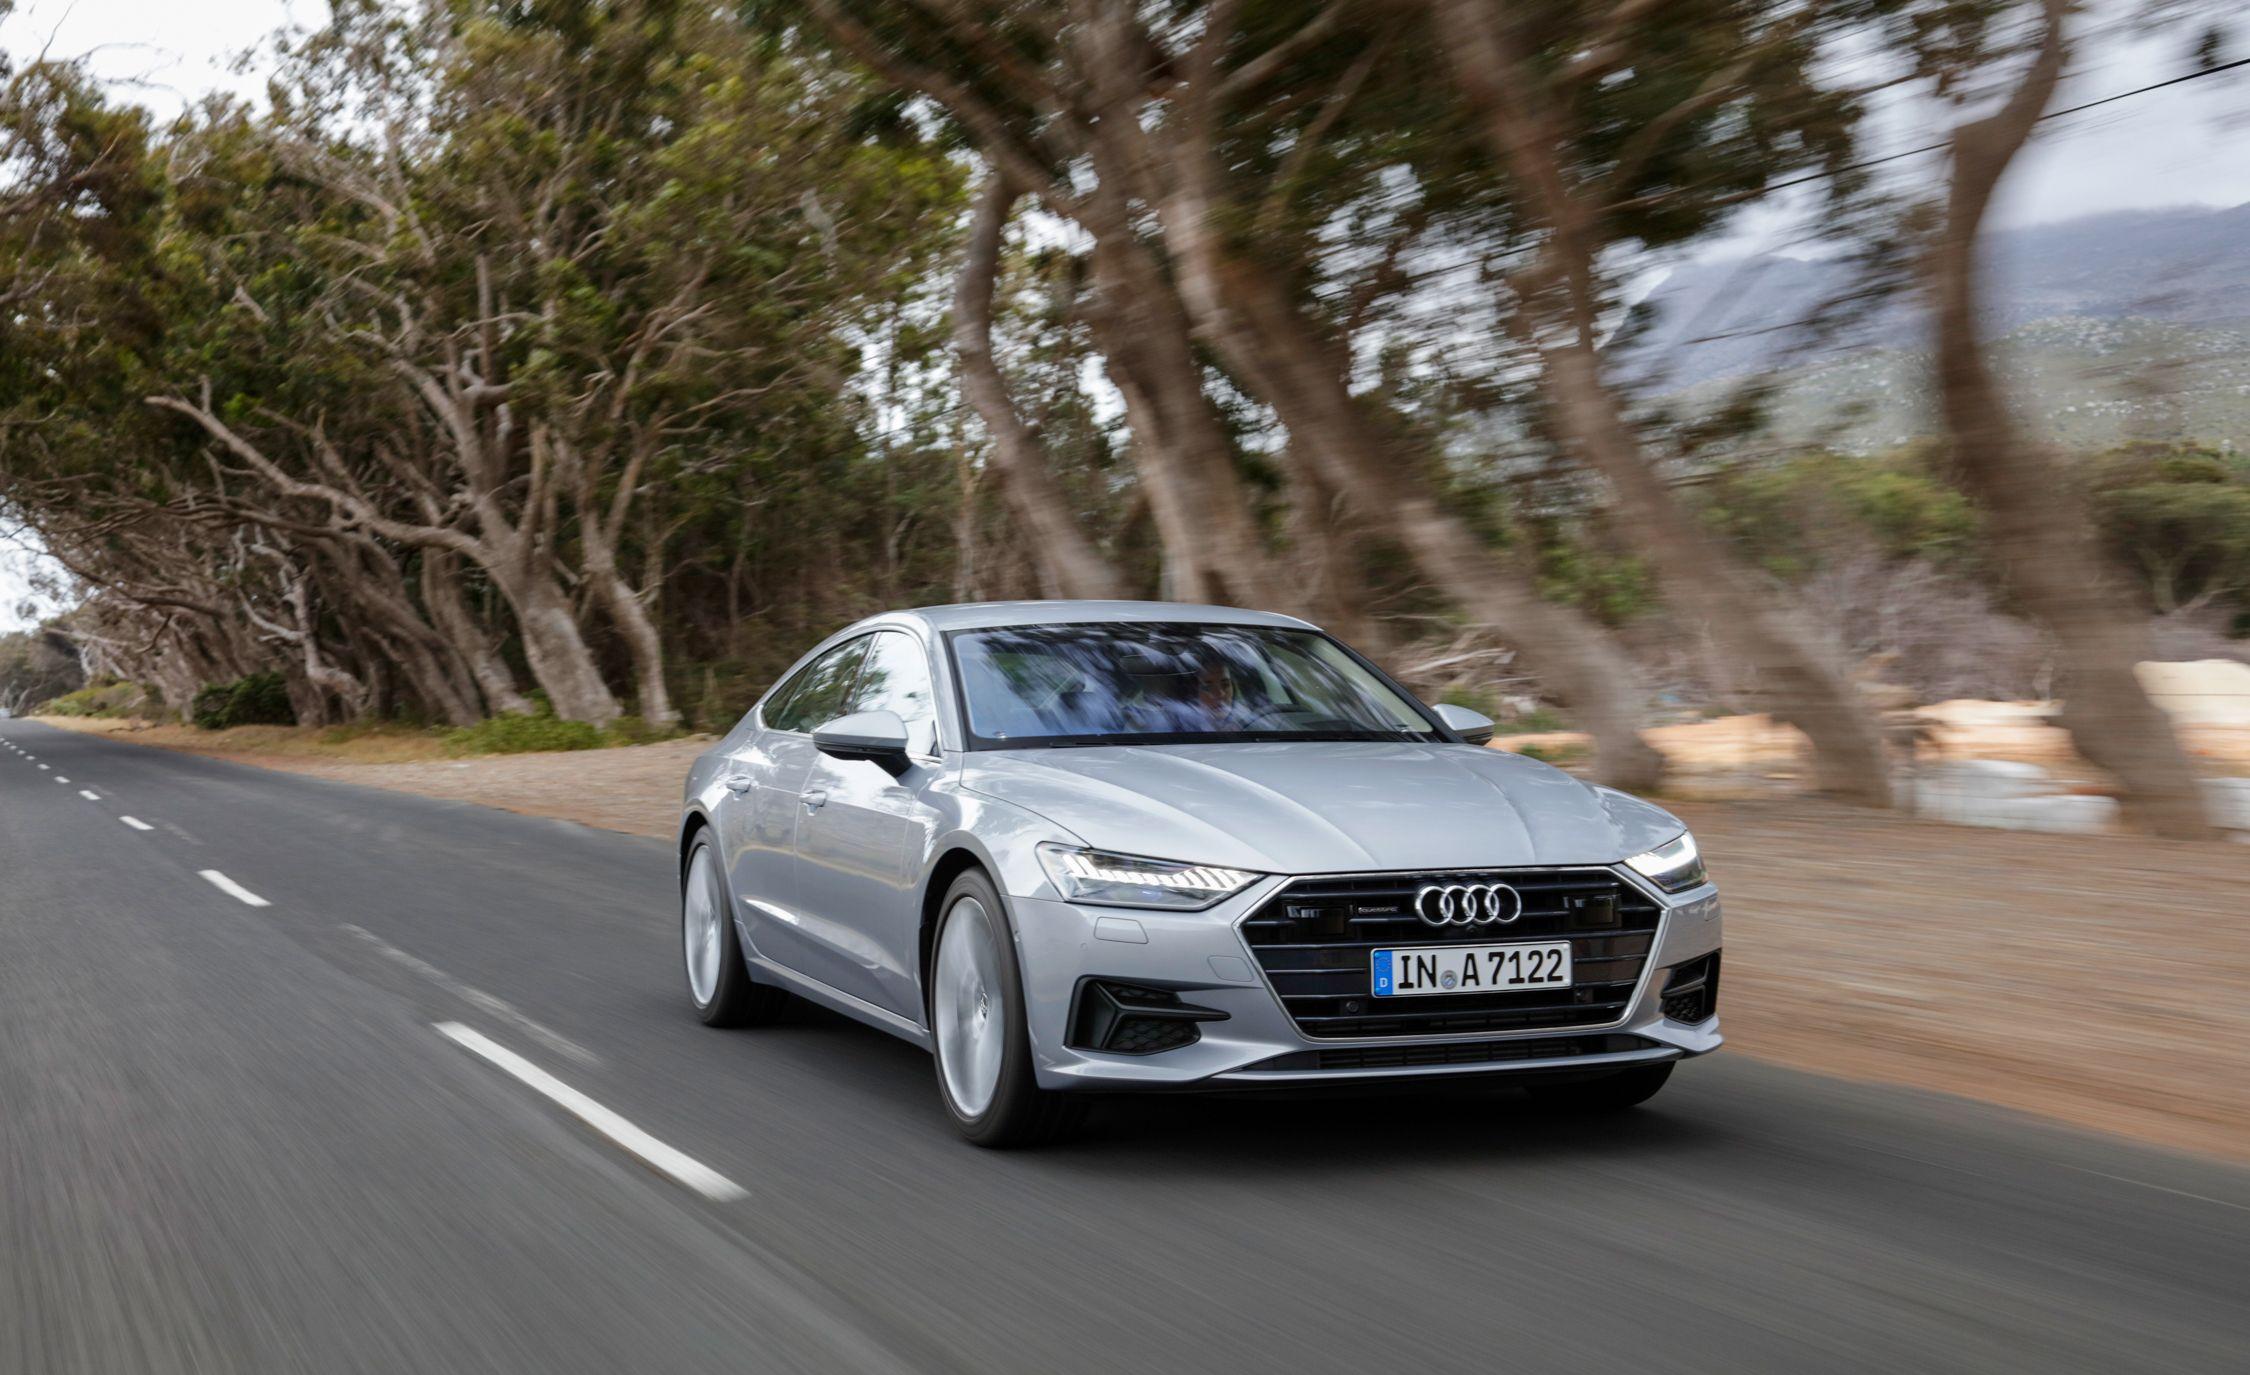 2019-Audi-A7-Sportback-132-1.jpg